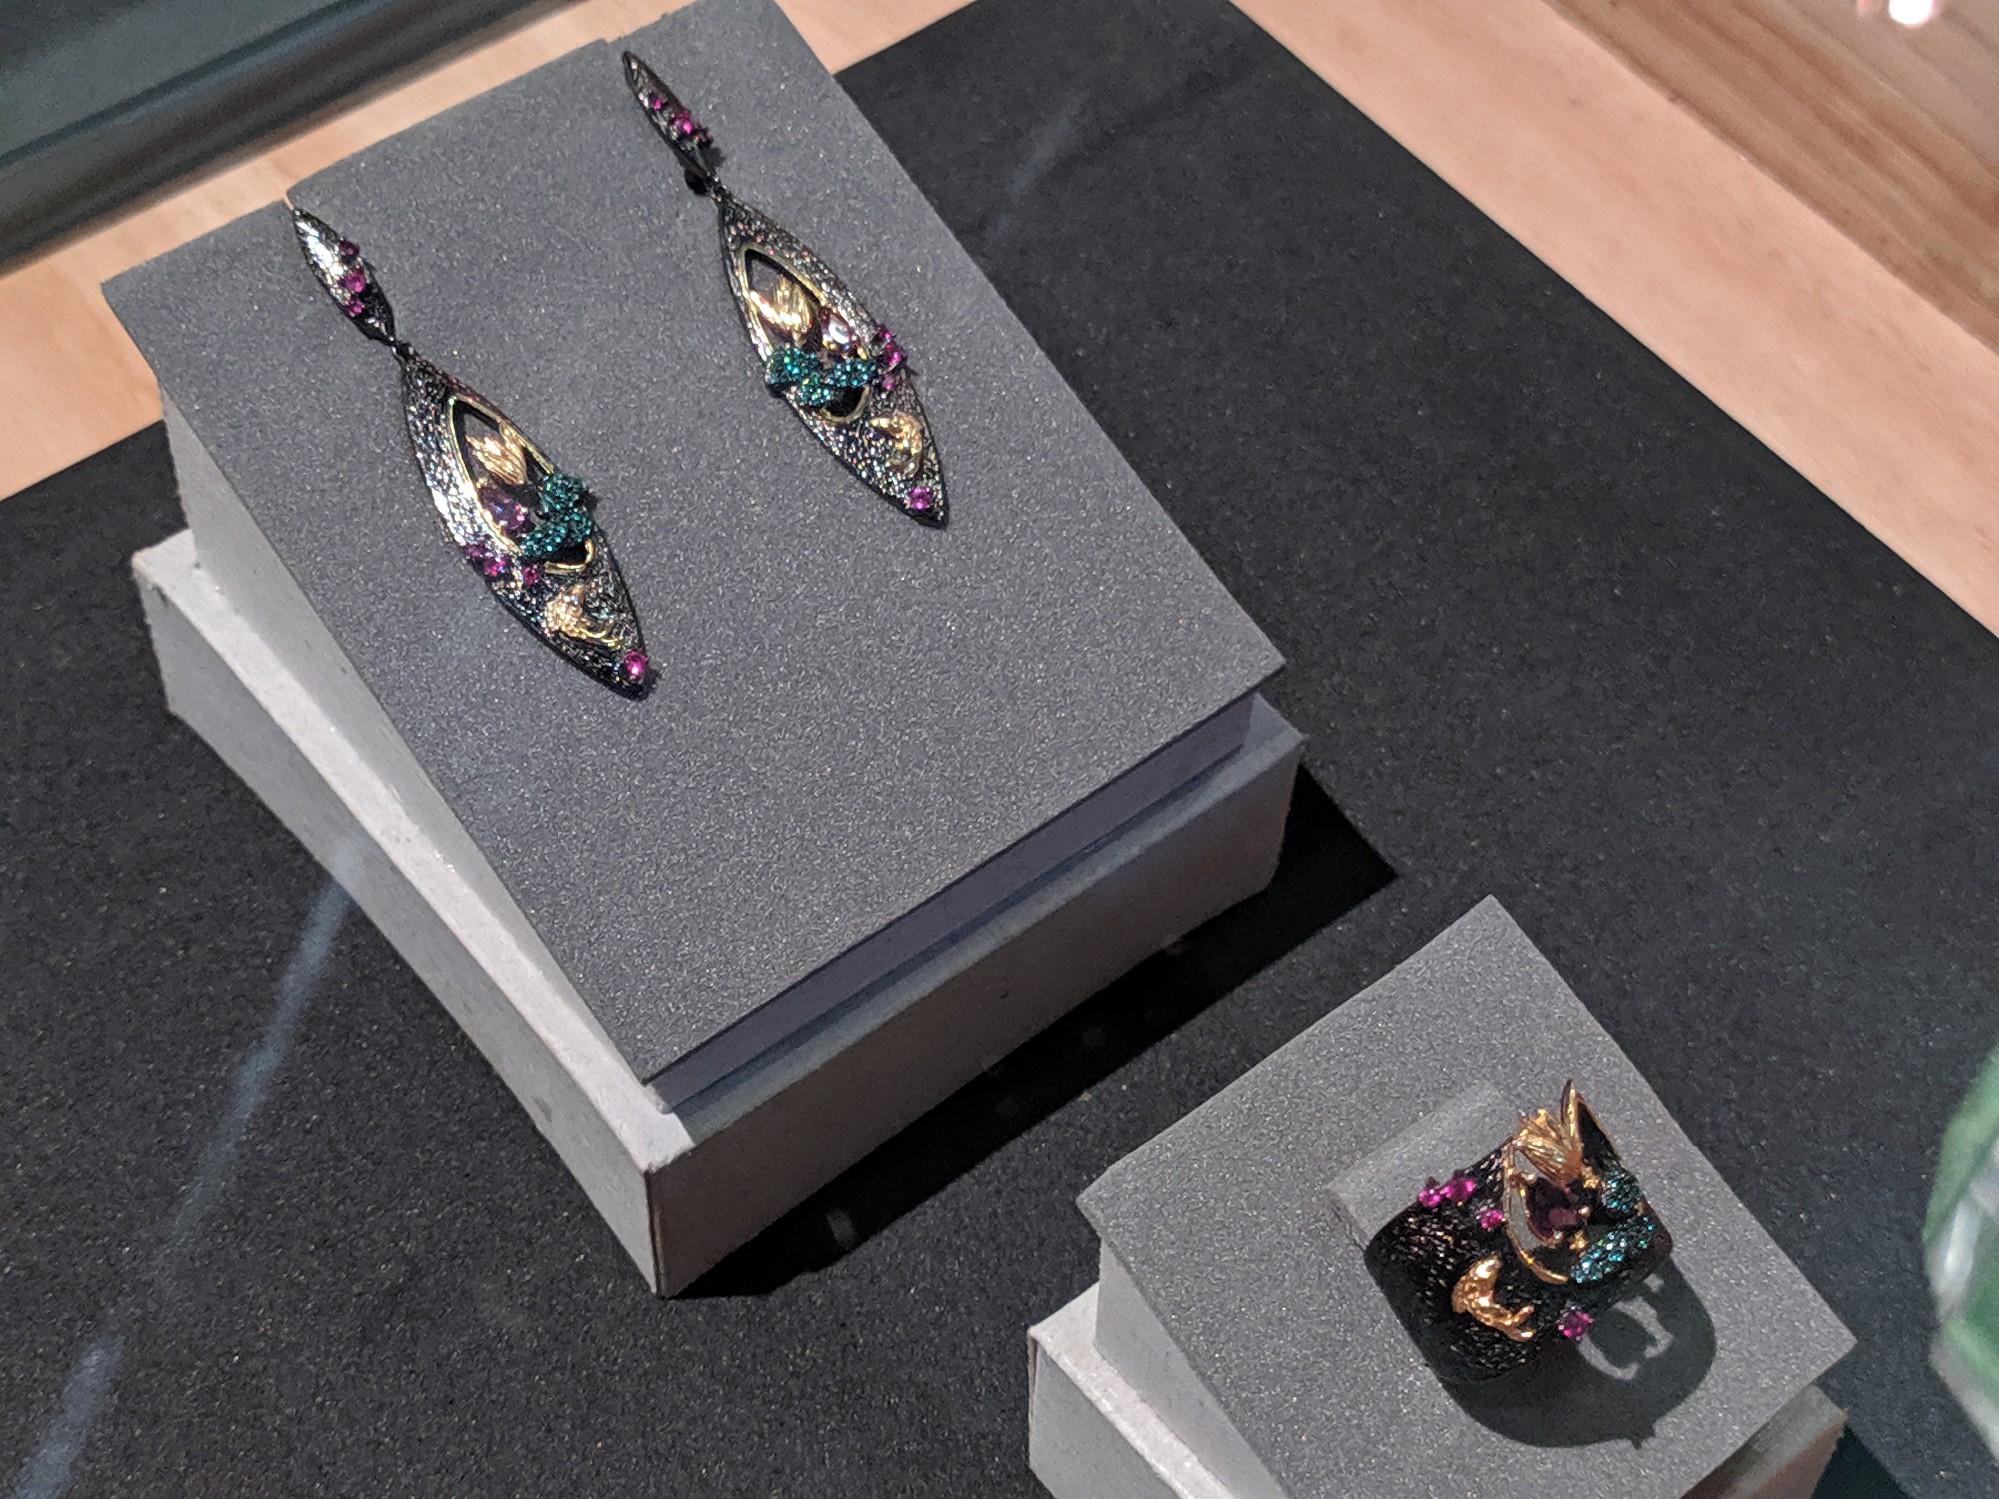 Las piezas de joyería de Firdaus son elaboradas por la artista Kira Romero